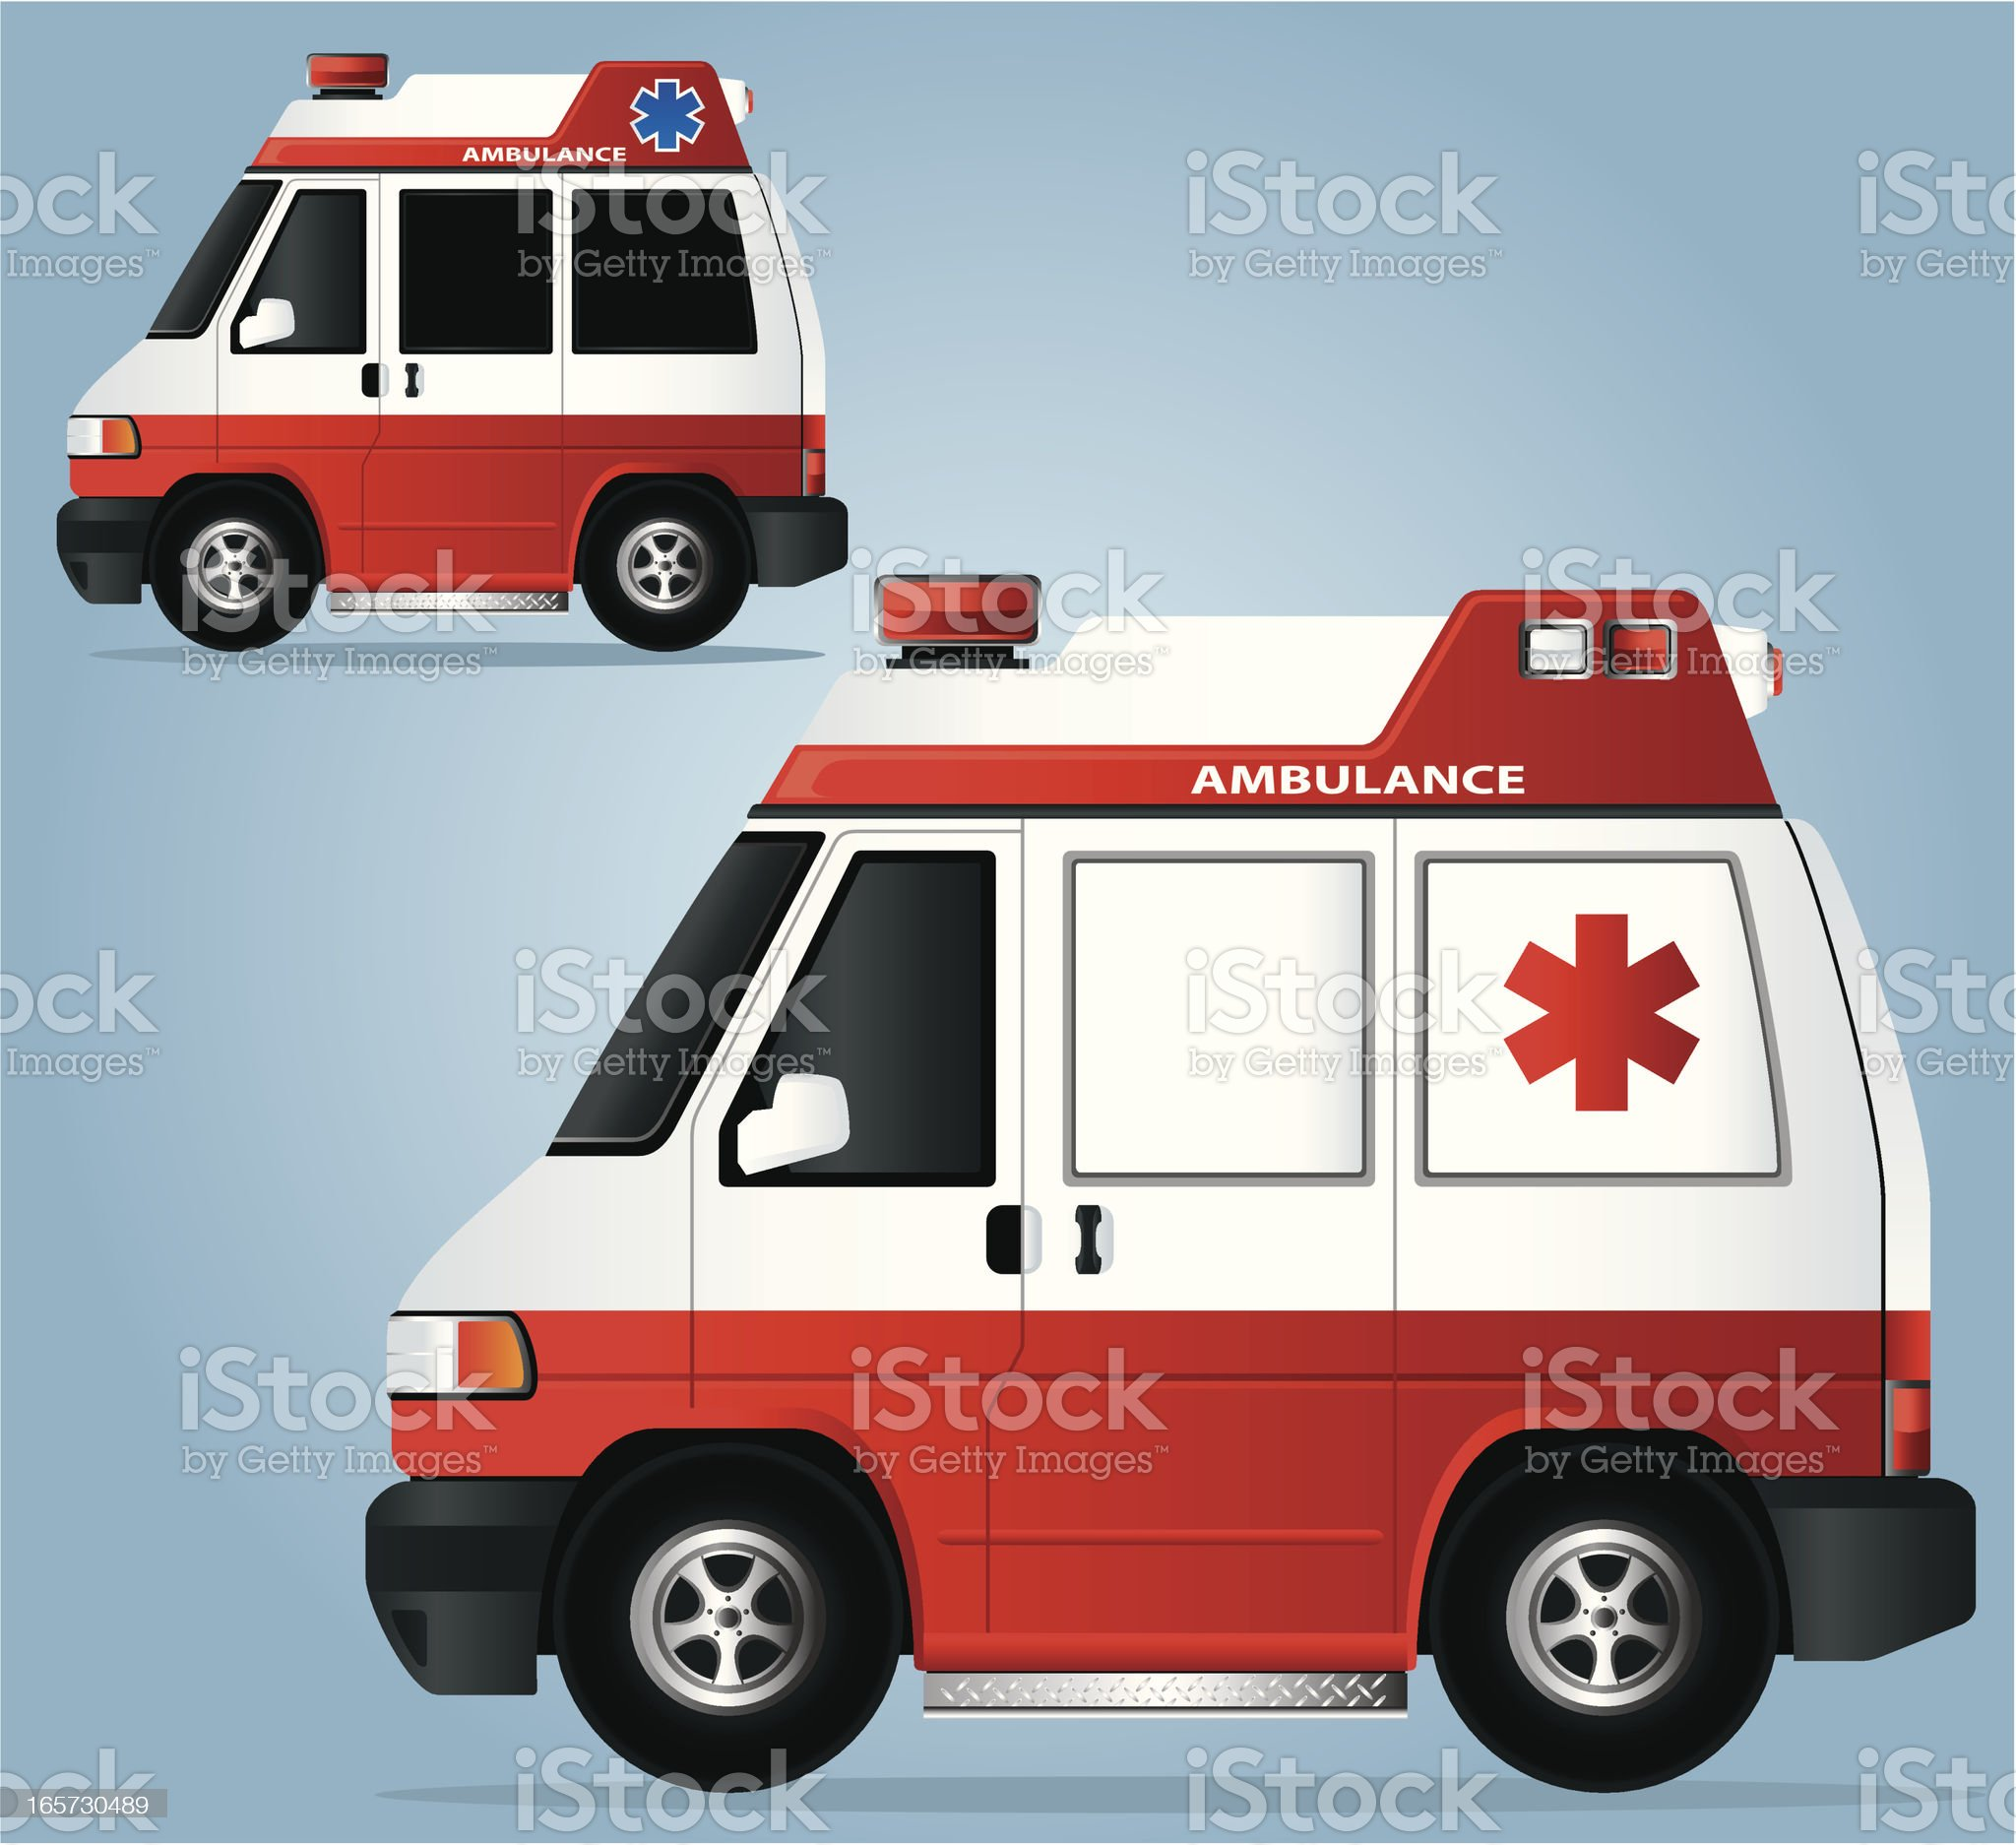 Ambulance royalty-free stock vector art